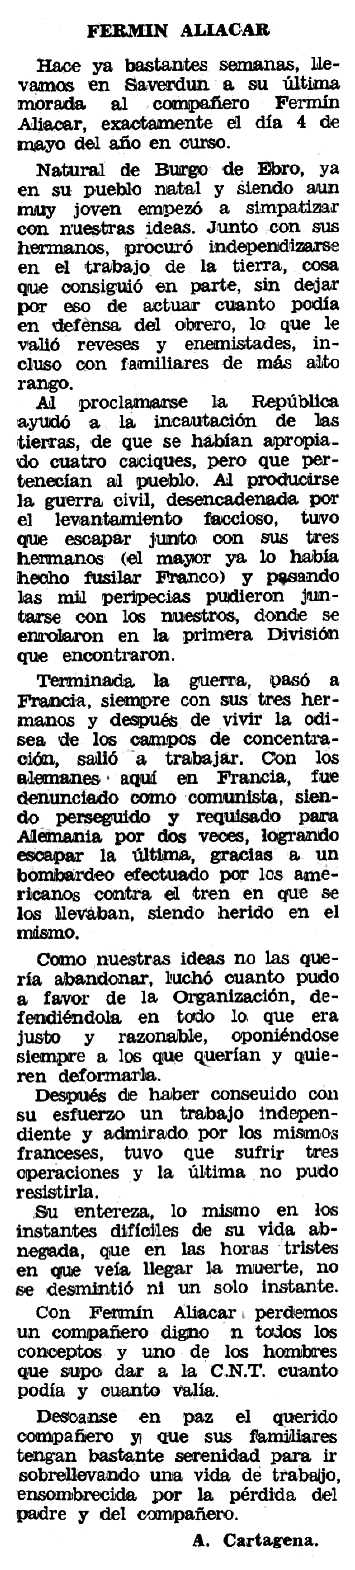 "Necrològica de Fermín Aliacar Garralaga apareguda en el periòdic tolosà ""Espoir"" de l'1 de novembre de 1970"